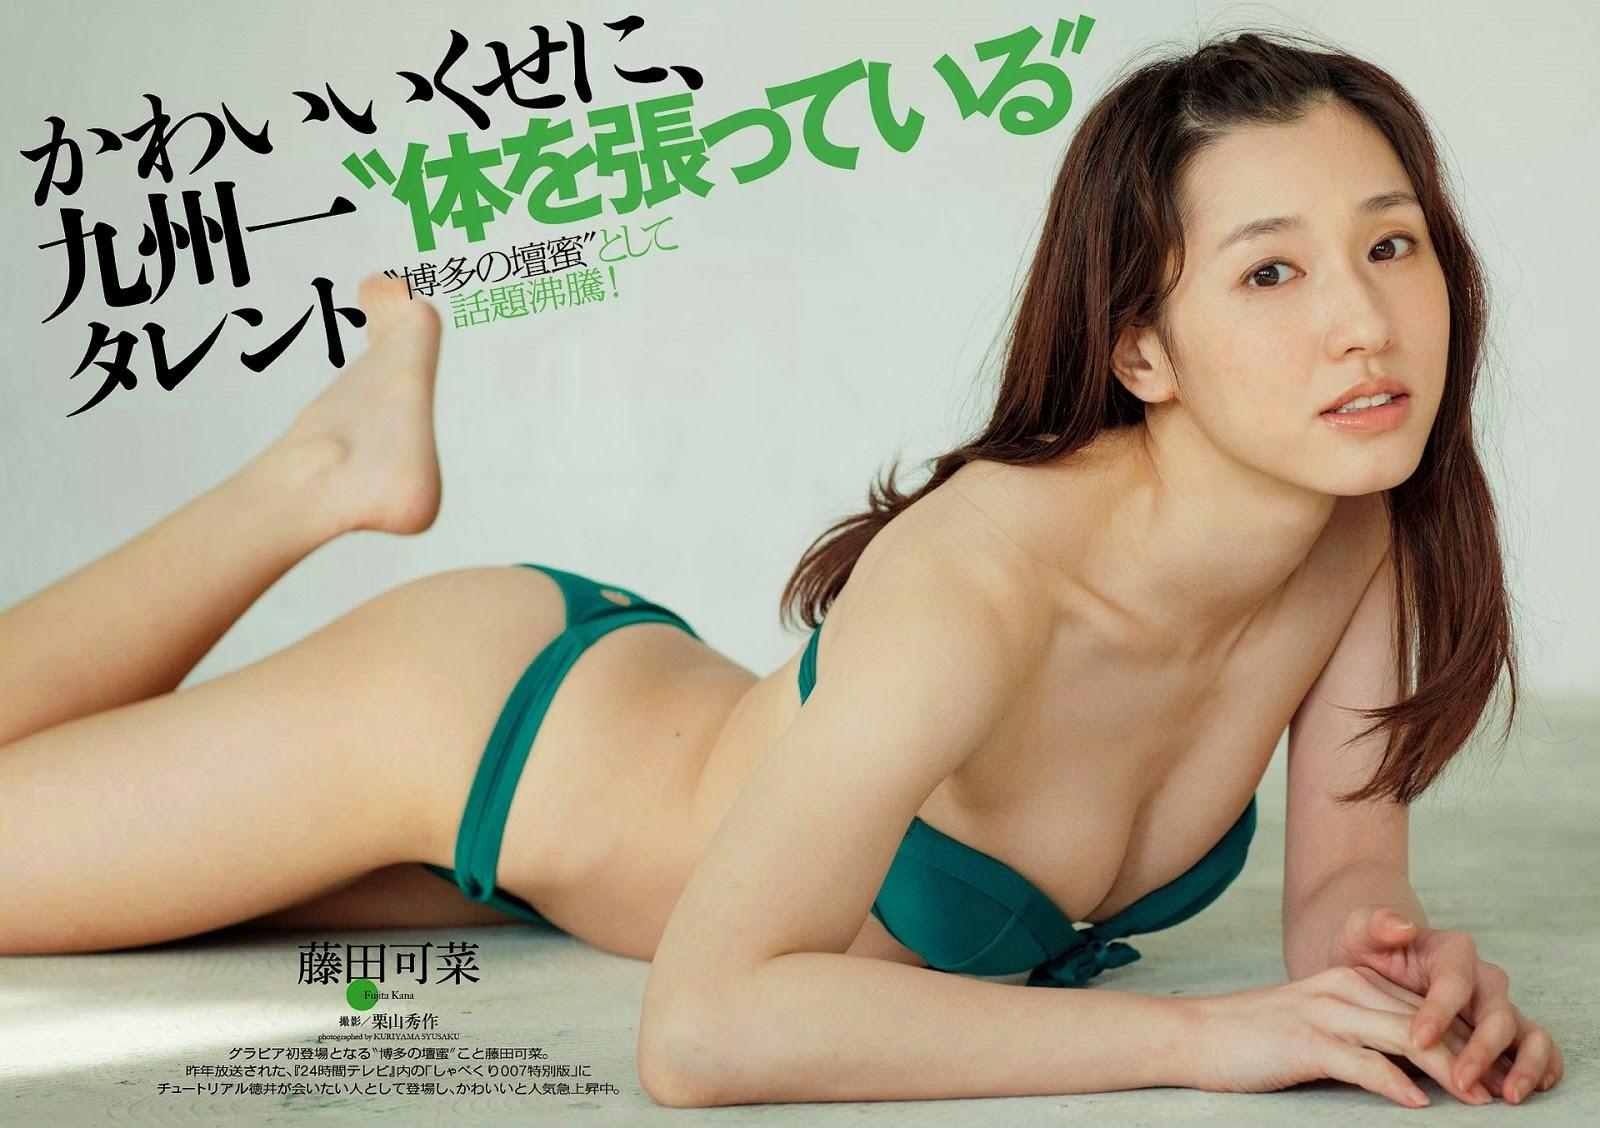 Fujita Kana 藤田可菜 Weekly Playboy March 2015 Wallpaper HD